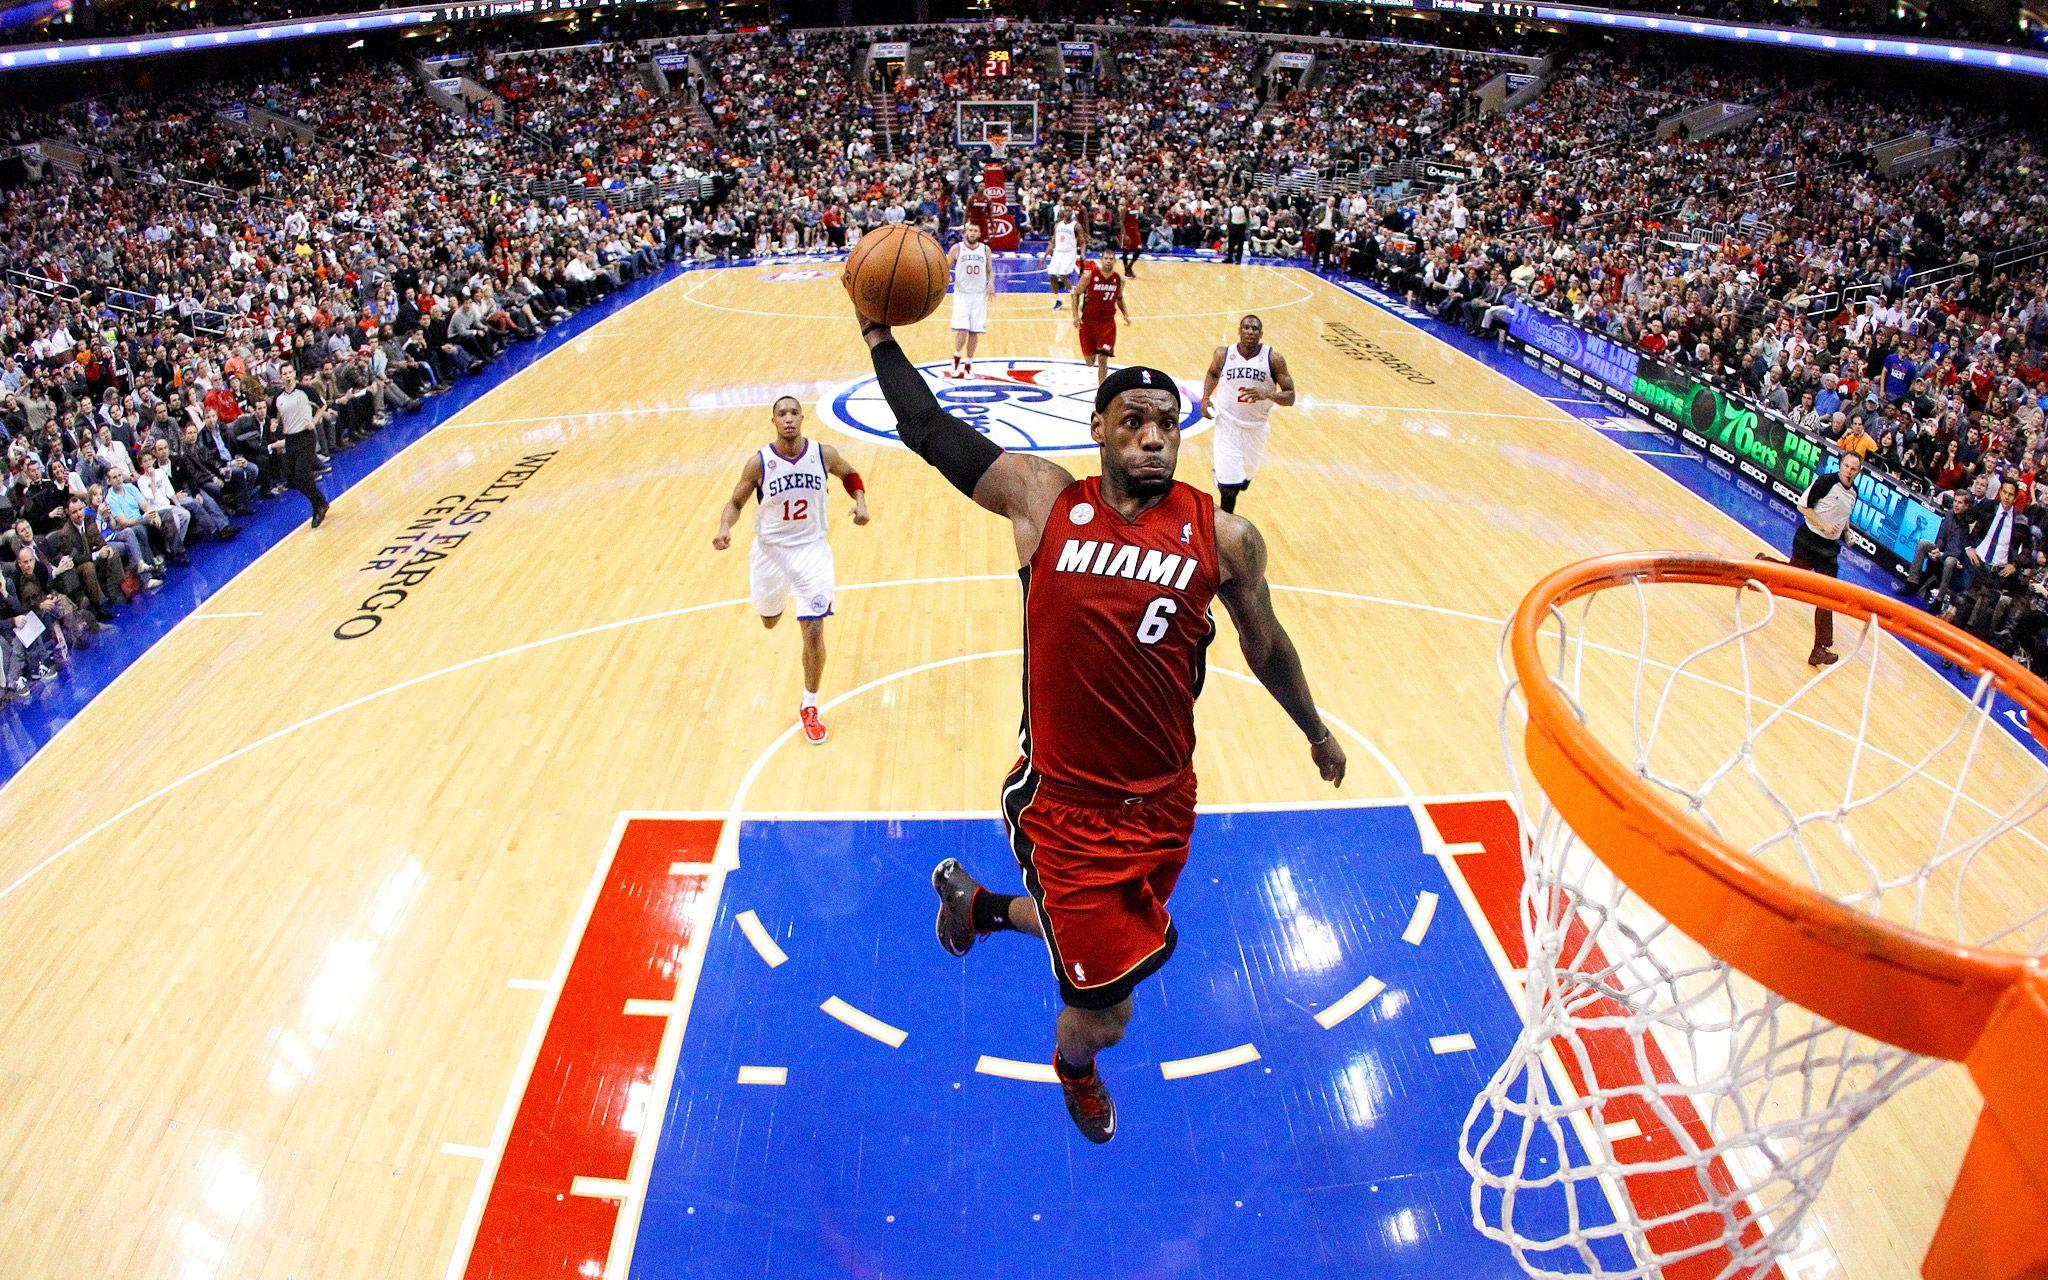 Di did lebron james become famous - Miami Heat Lebron James Slam Dunk In Nba